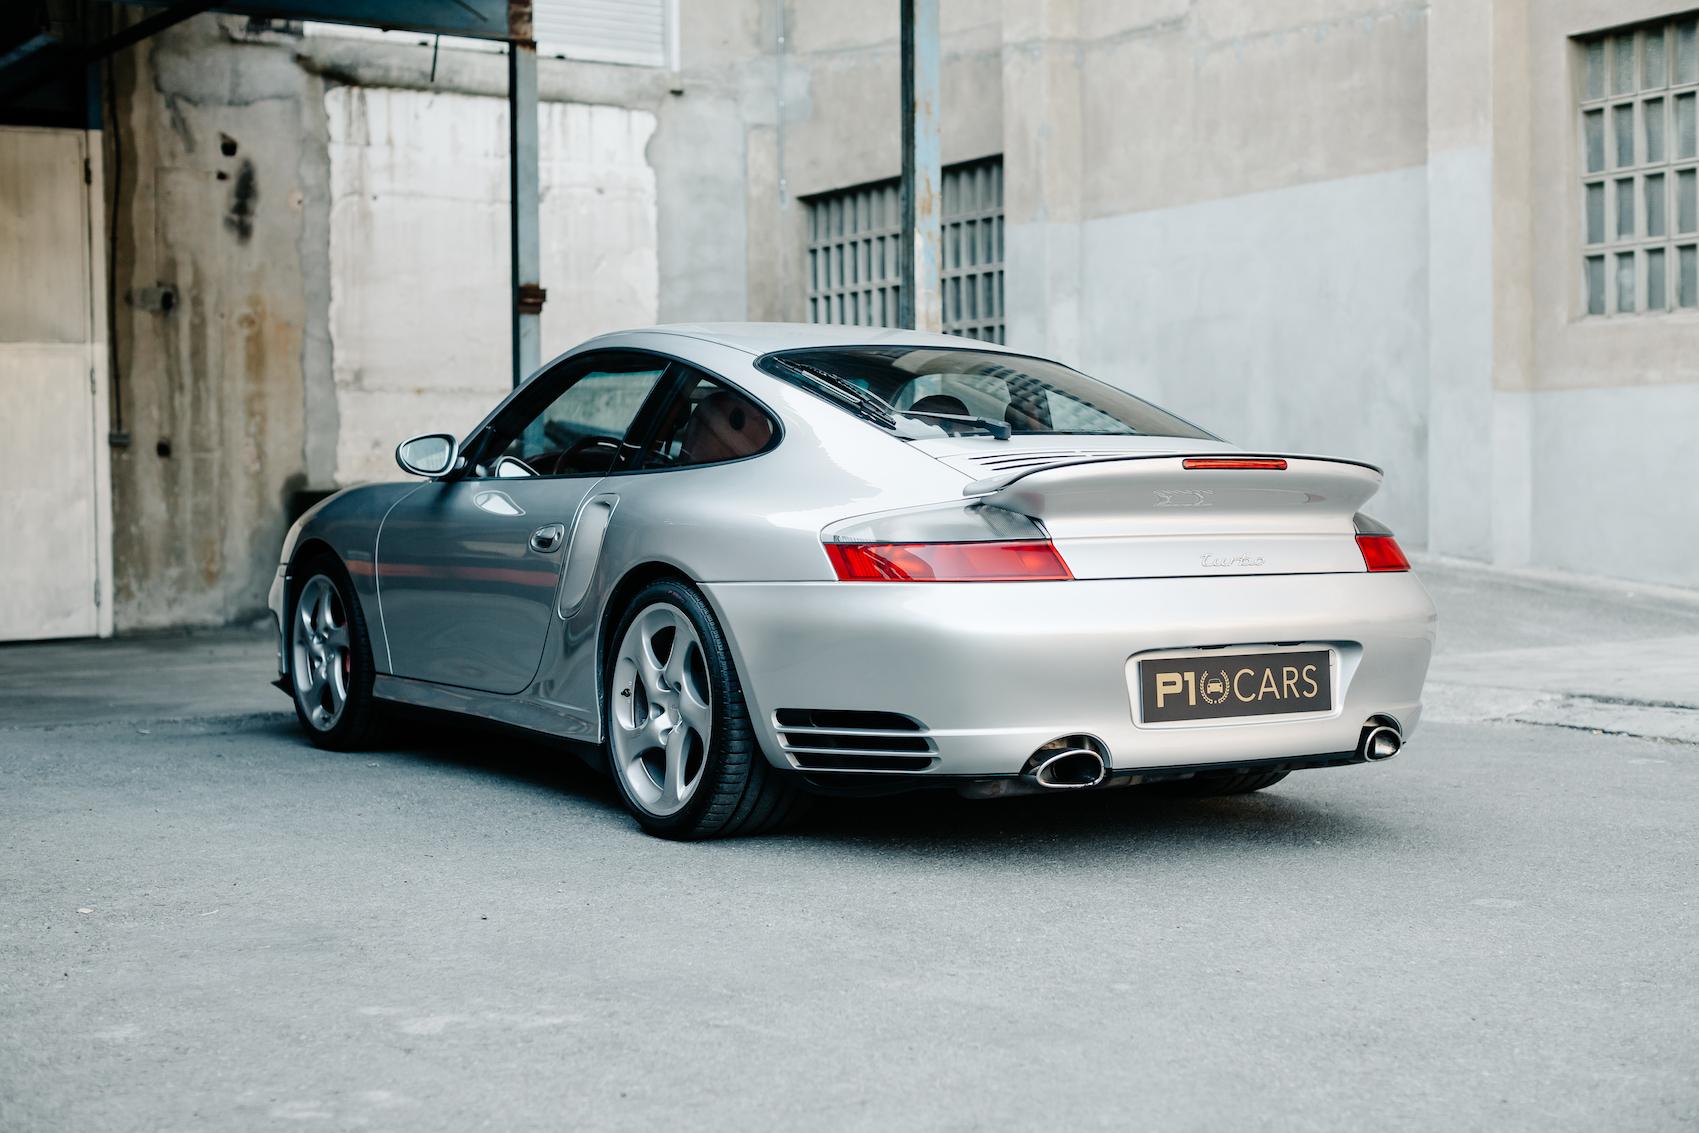 Porsche 996 Turbo >> Porsche 996 Turbo For Sale Buyer S Guide Elferspot Com